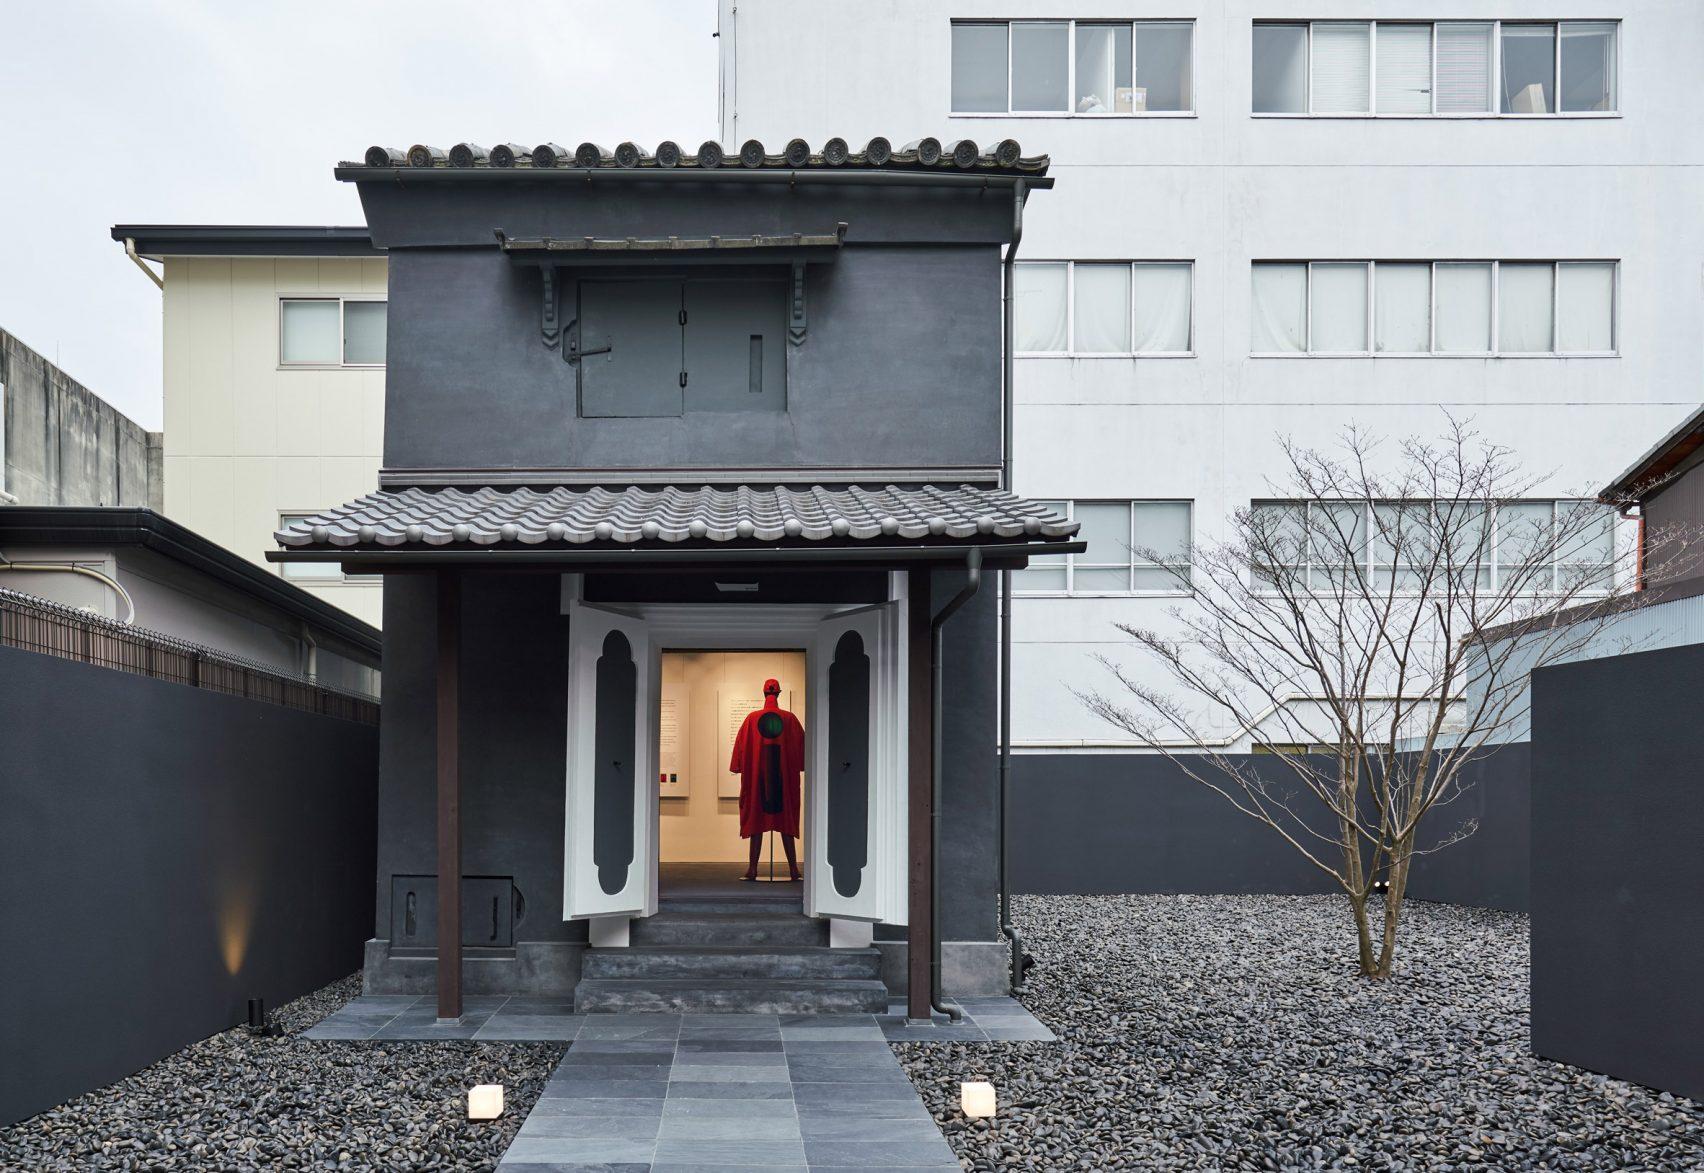 interiors-retail-shops-issey-miyake-kyoto-japan_dezeen_2364_col_1-1704x1173.jpg